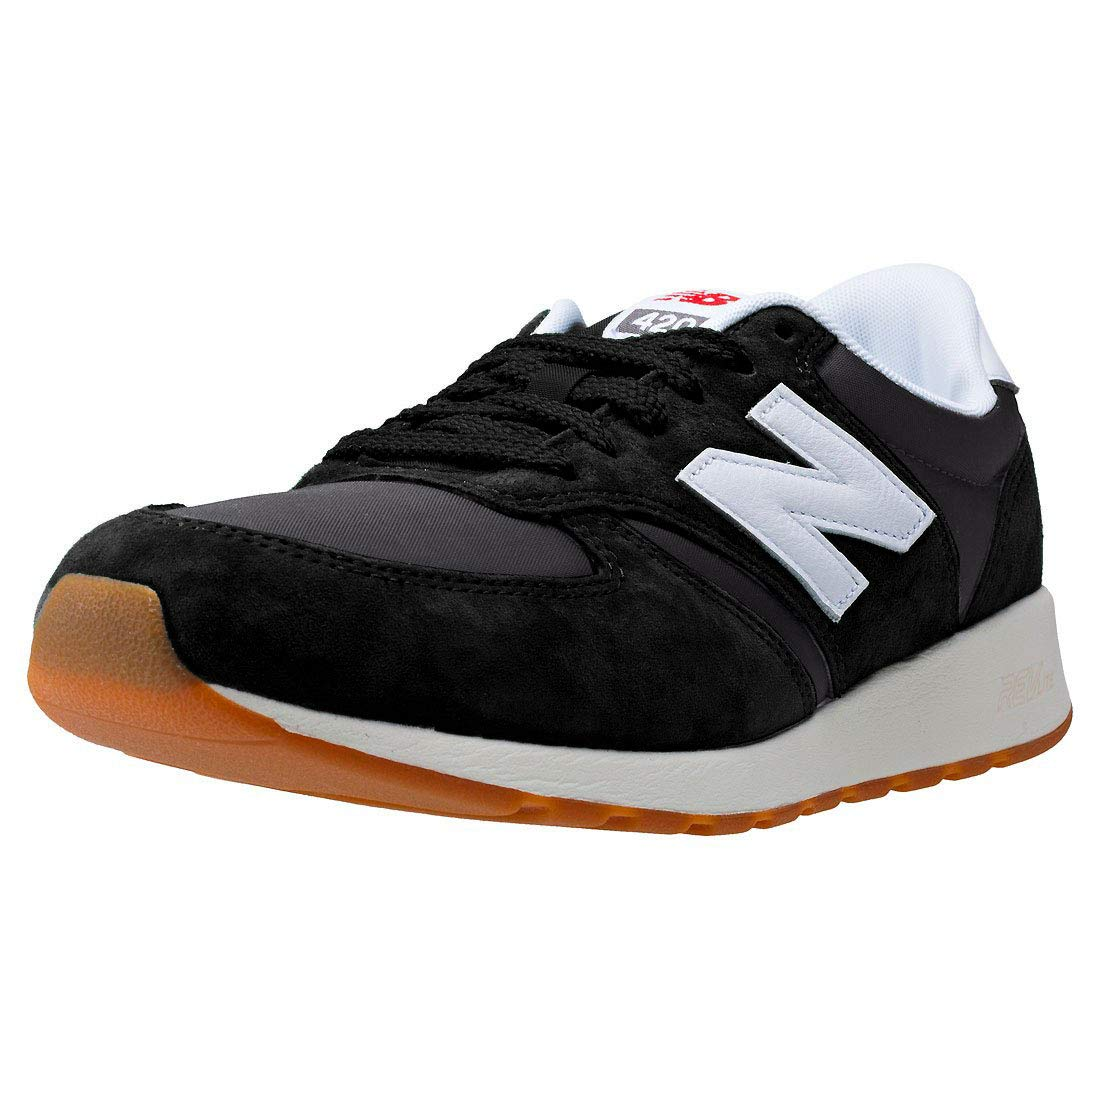 Buy new balance Men's 420 Black Leather Running Shoes - 12.5 UK ...